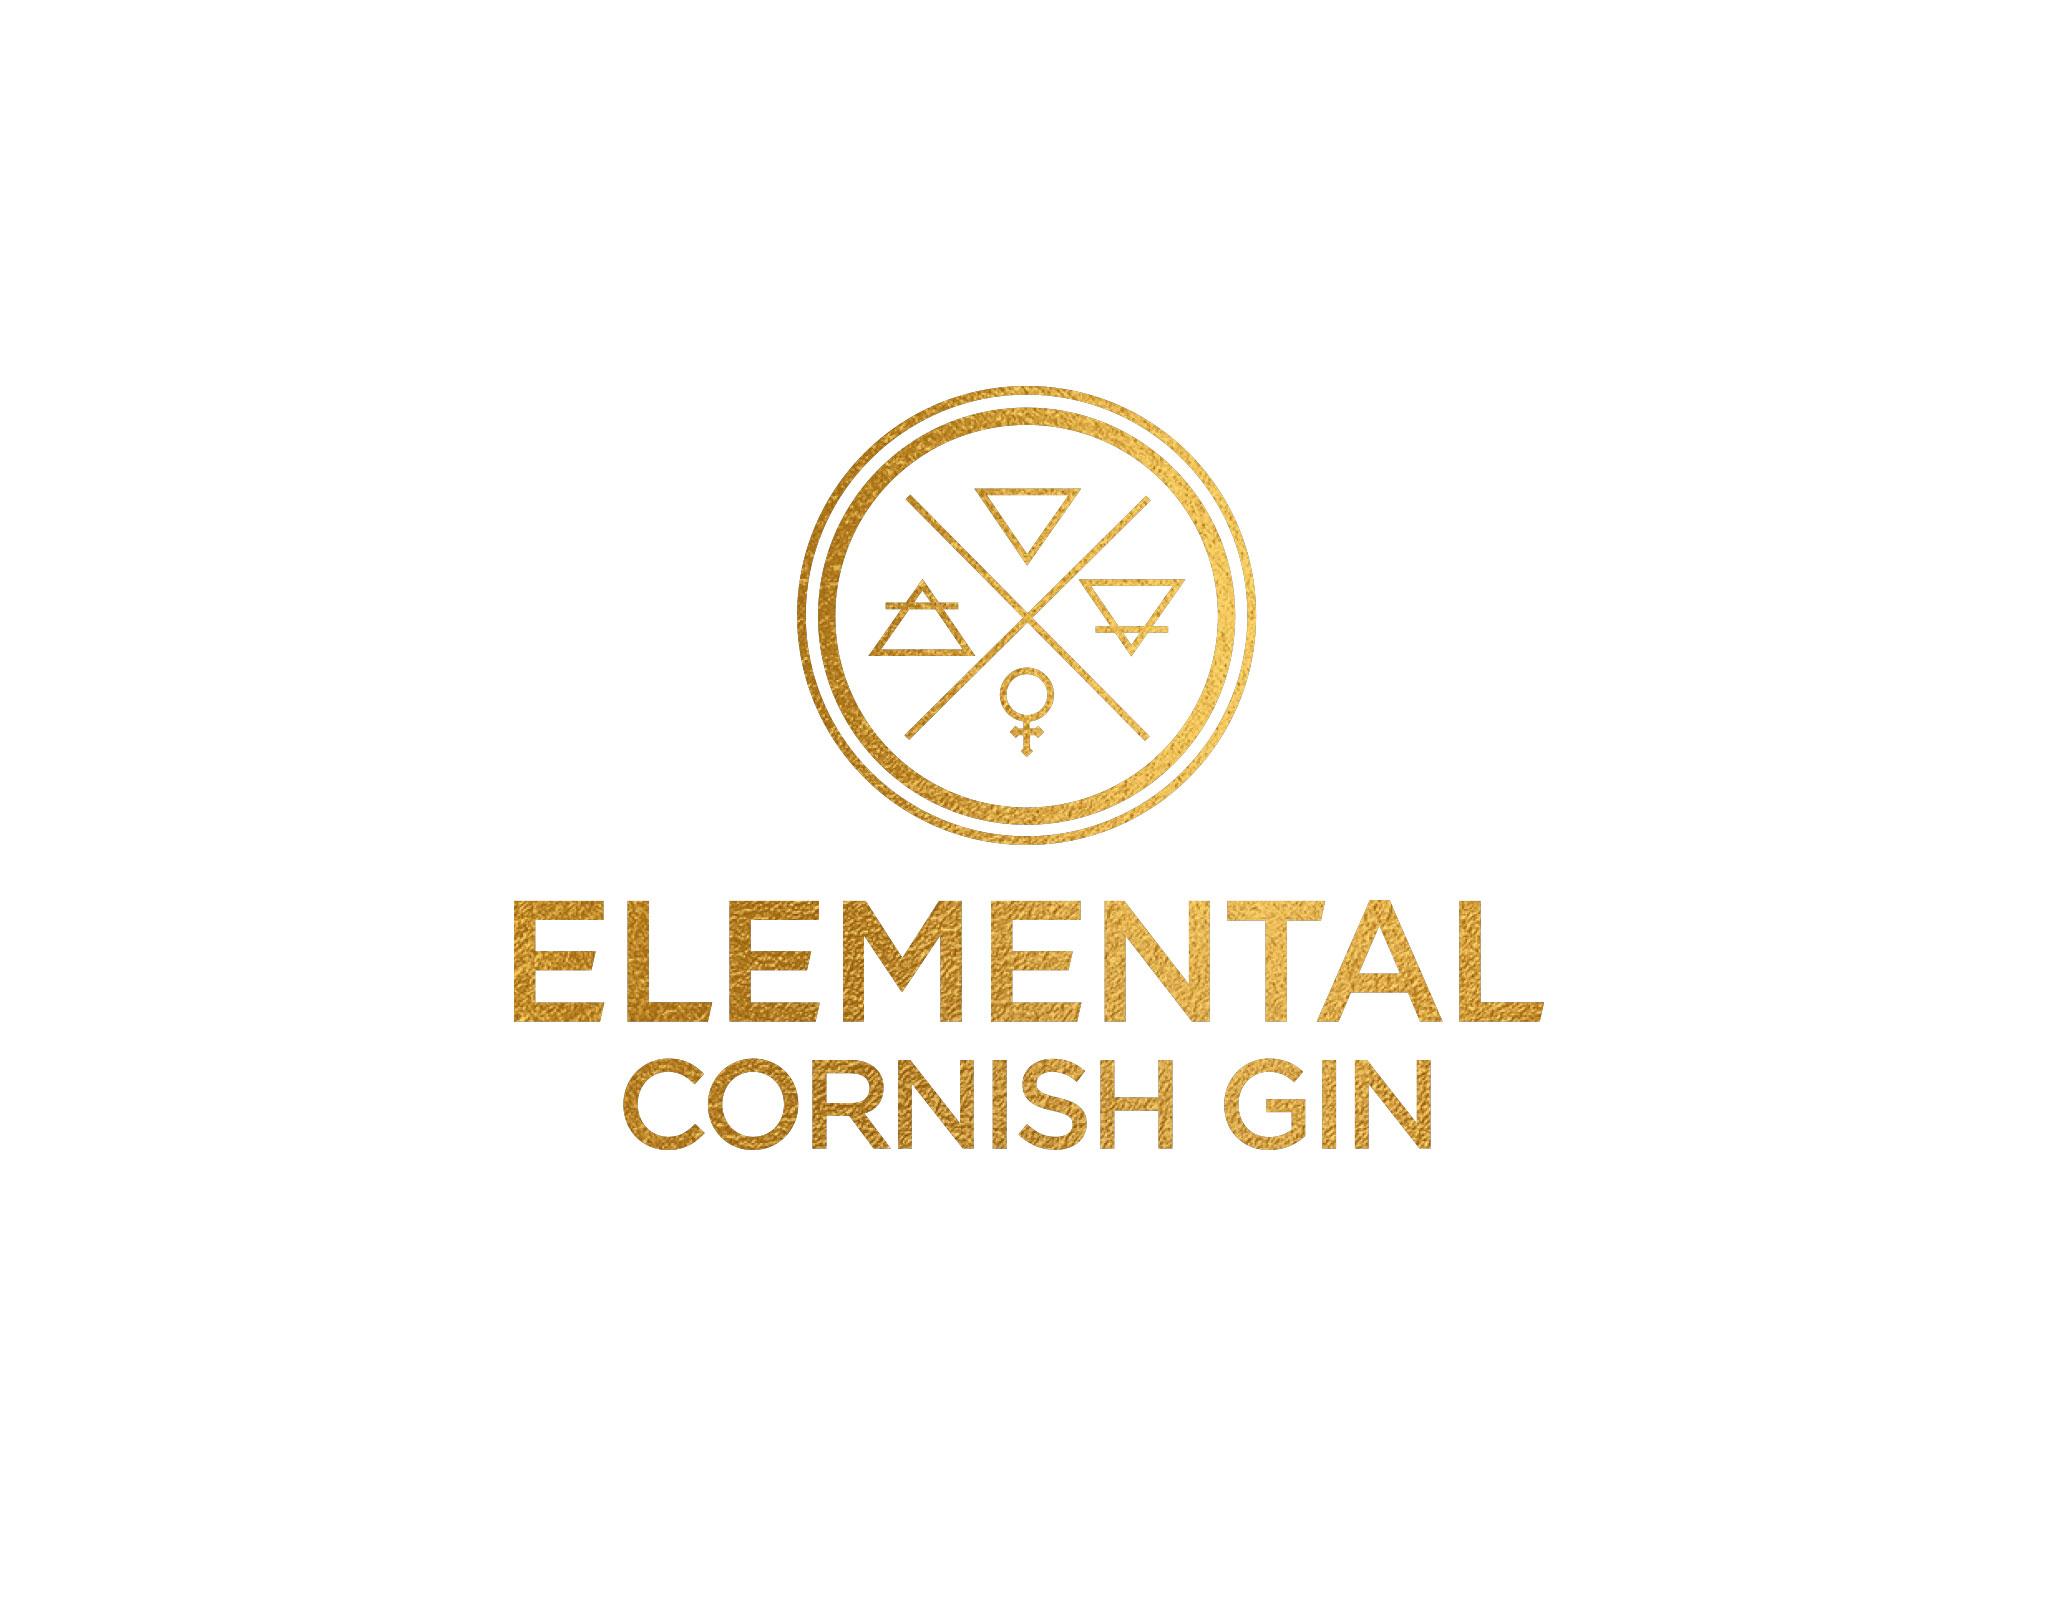 Elemental Cornish Gin bottle logo design